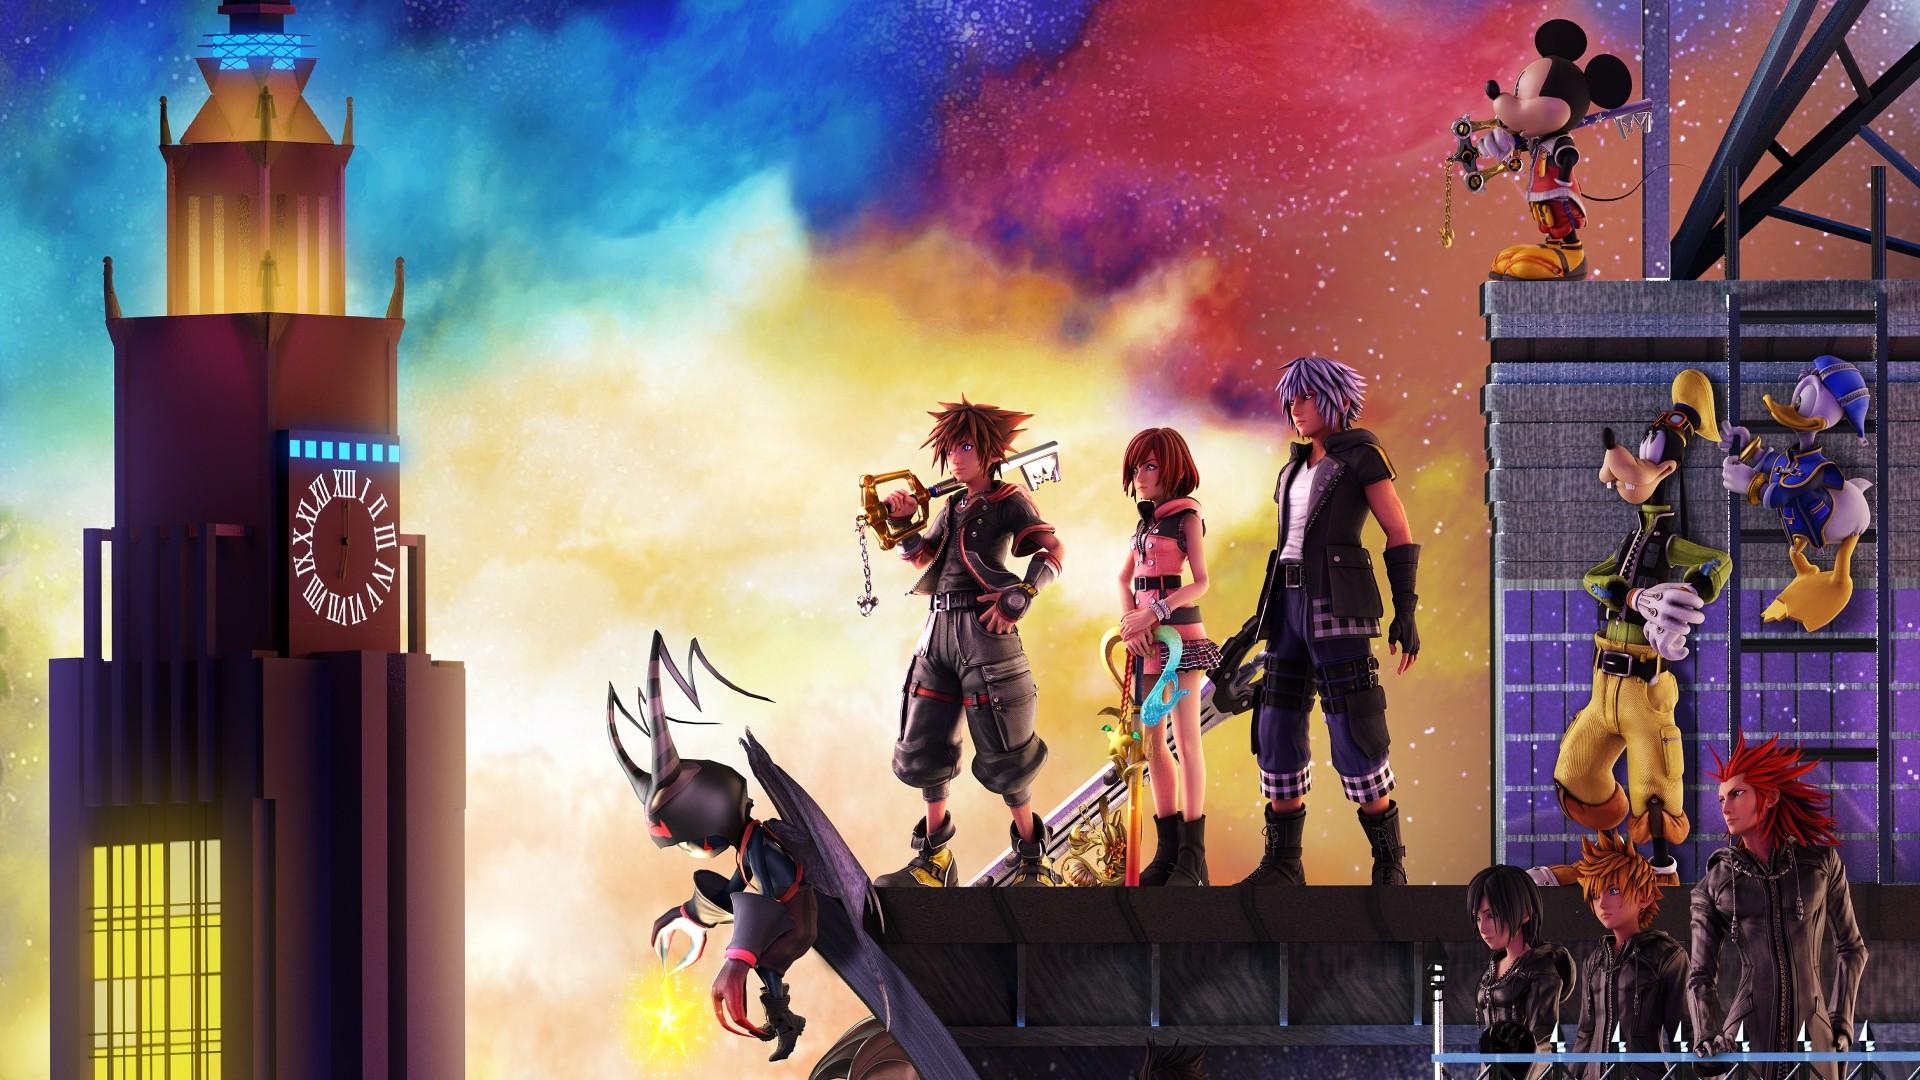 Kingdom Hearts 3 Wallpaper image hd